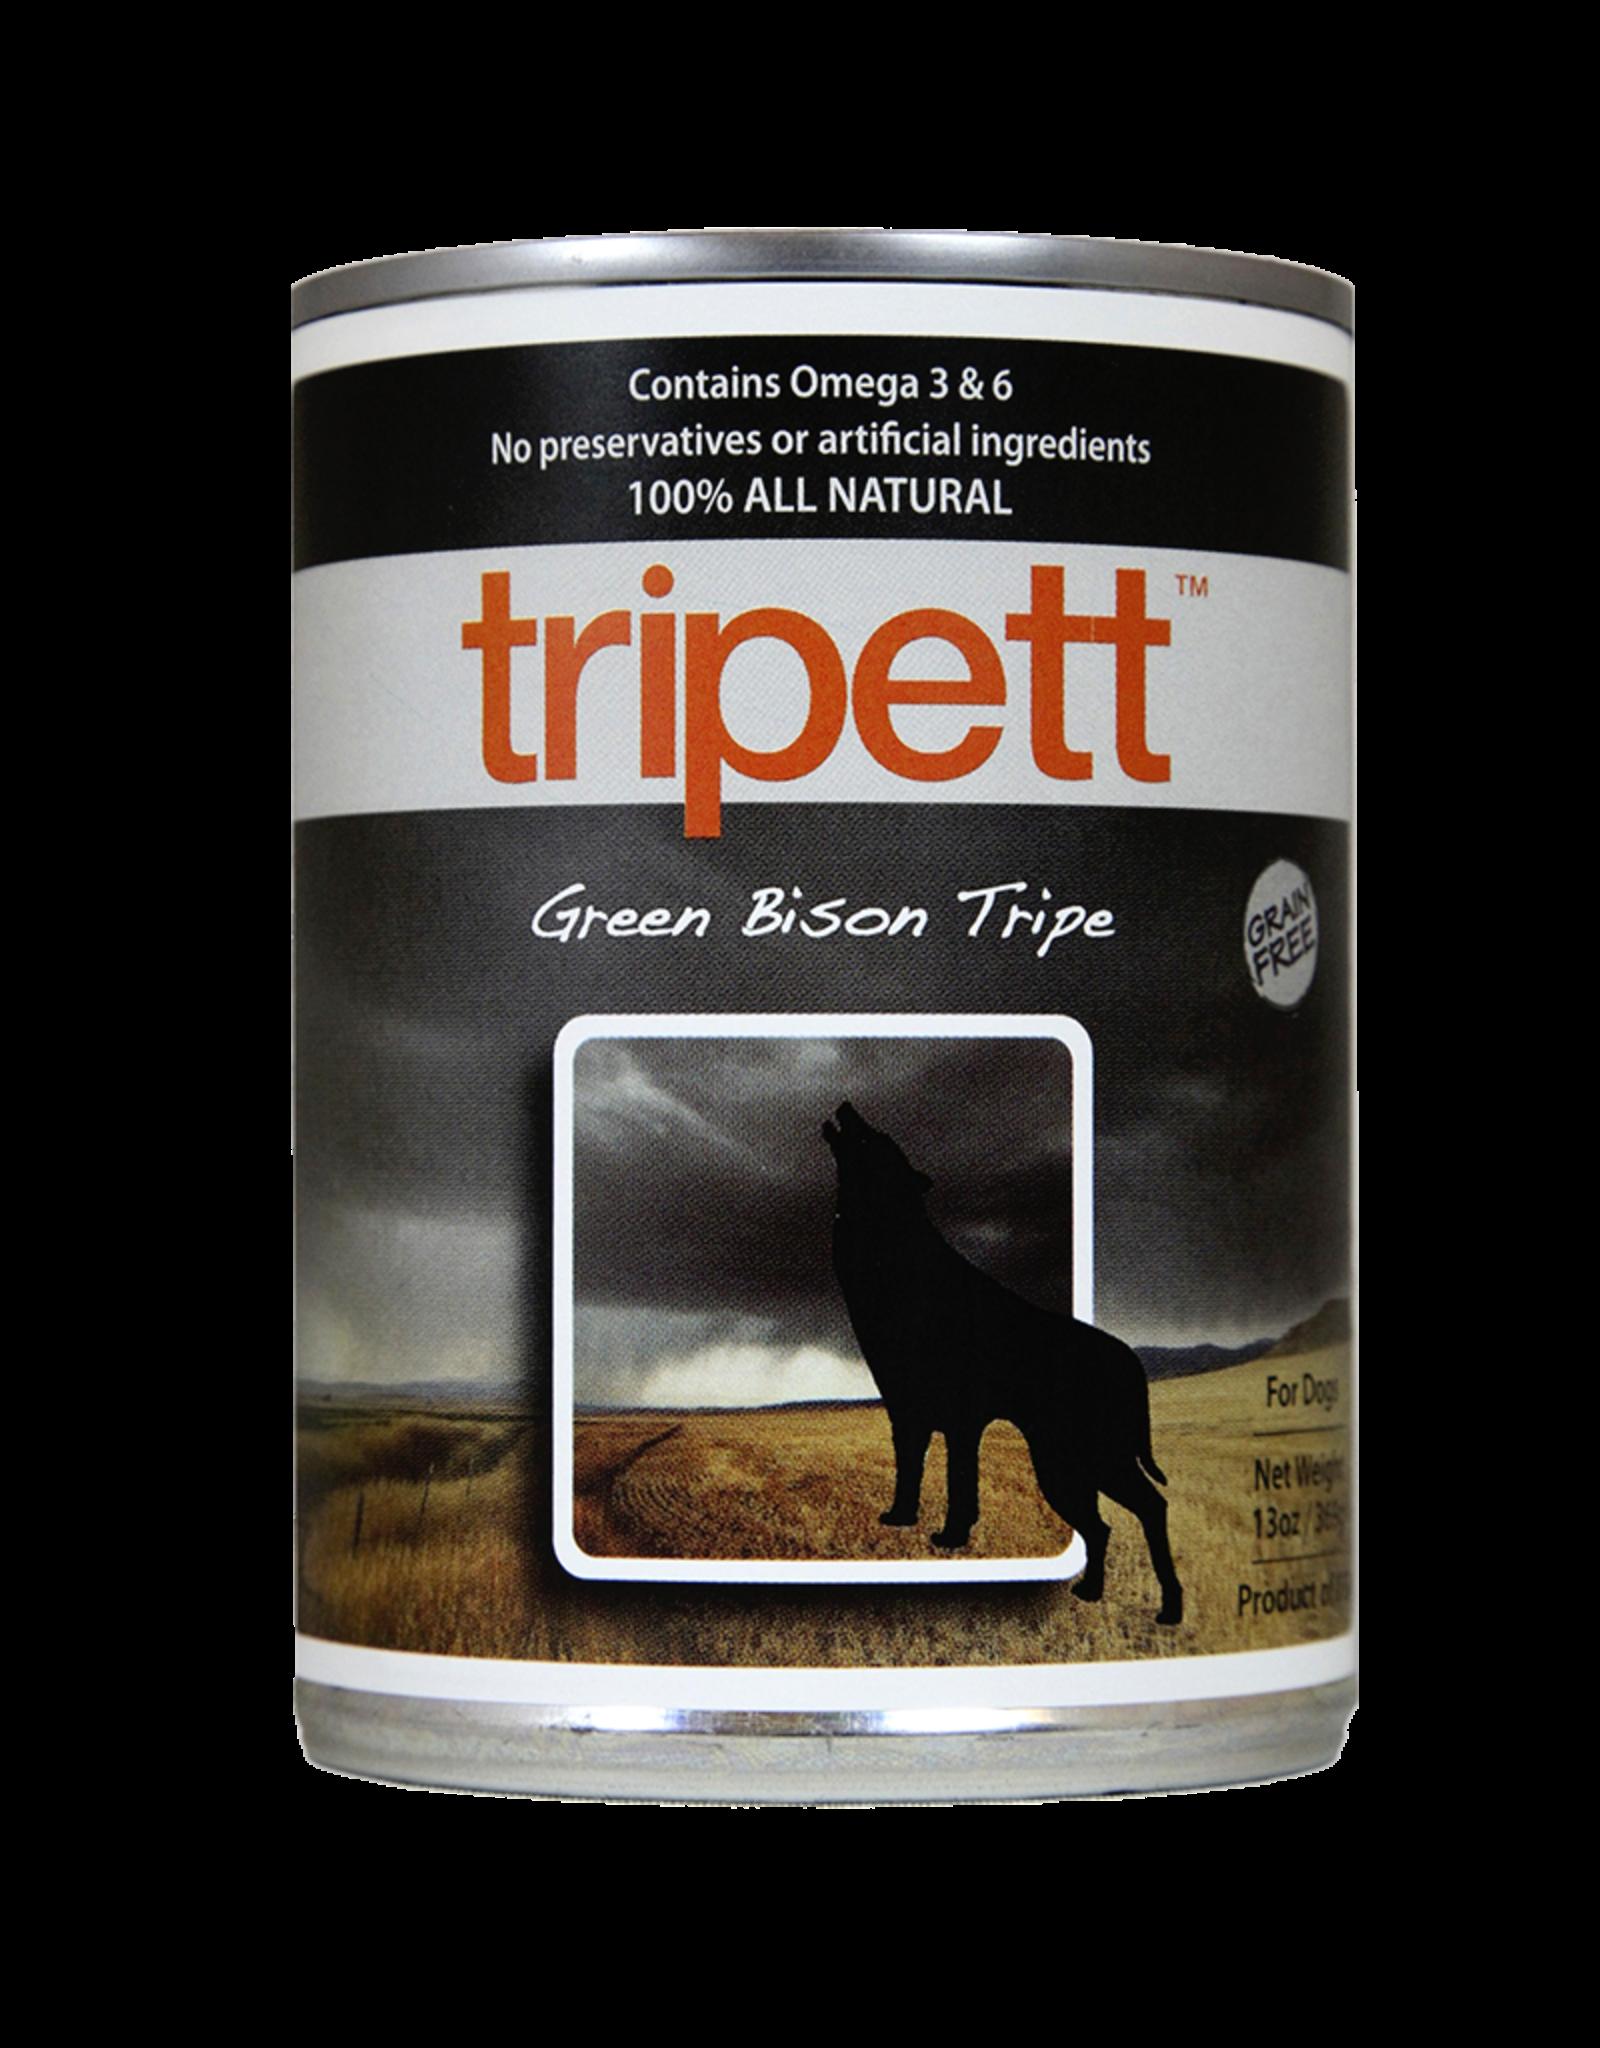 PetKind Dog Green Bison Tripe Tripett - Grain-Free 12.8oz